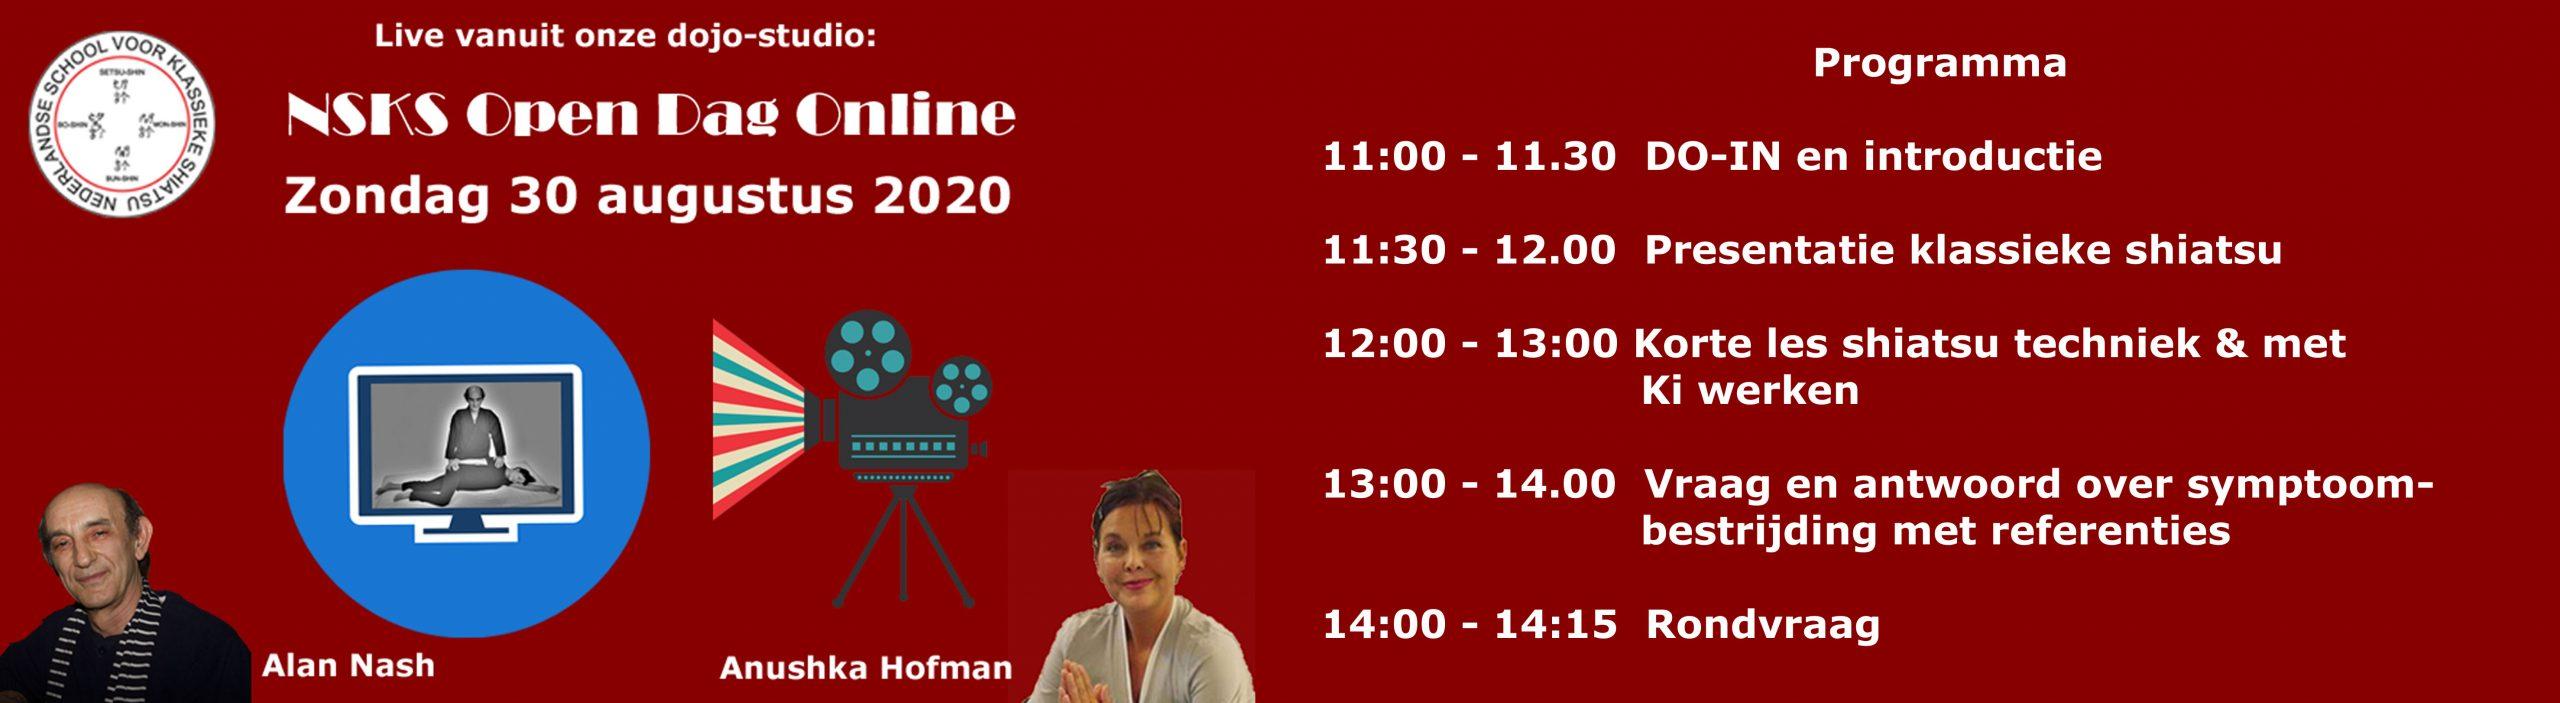 30 augustus 2020 Online Open Dag NSKS